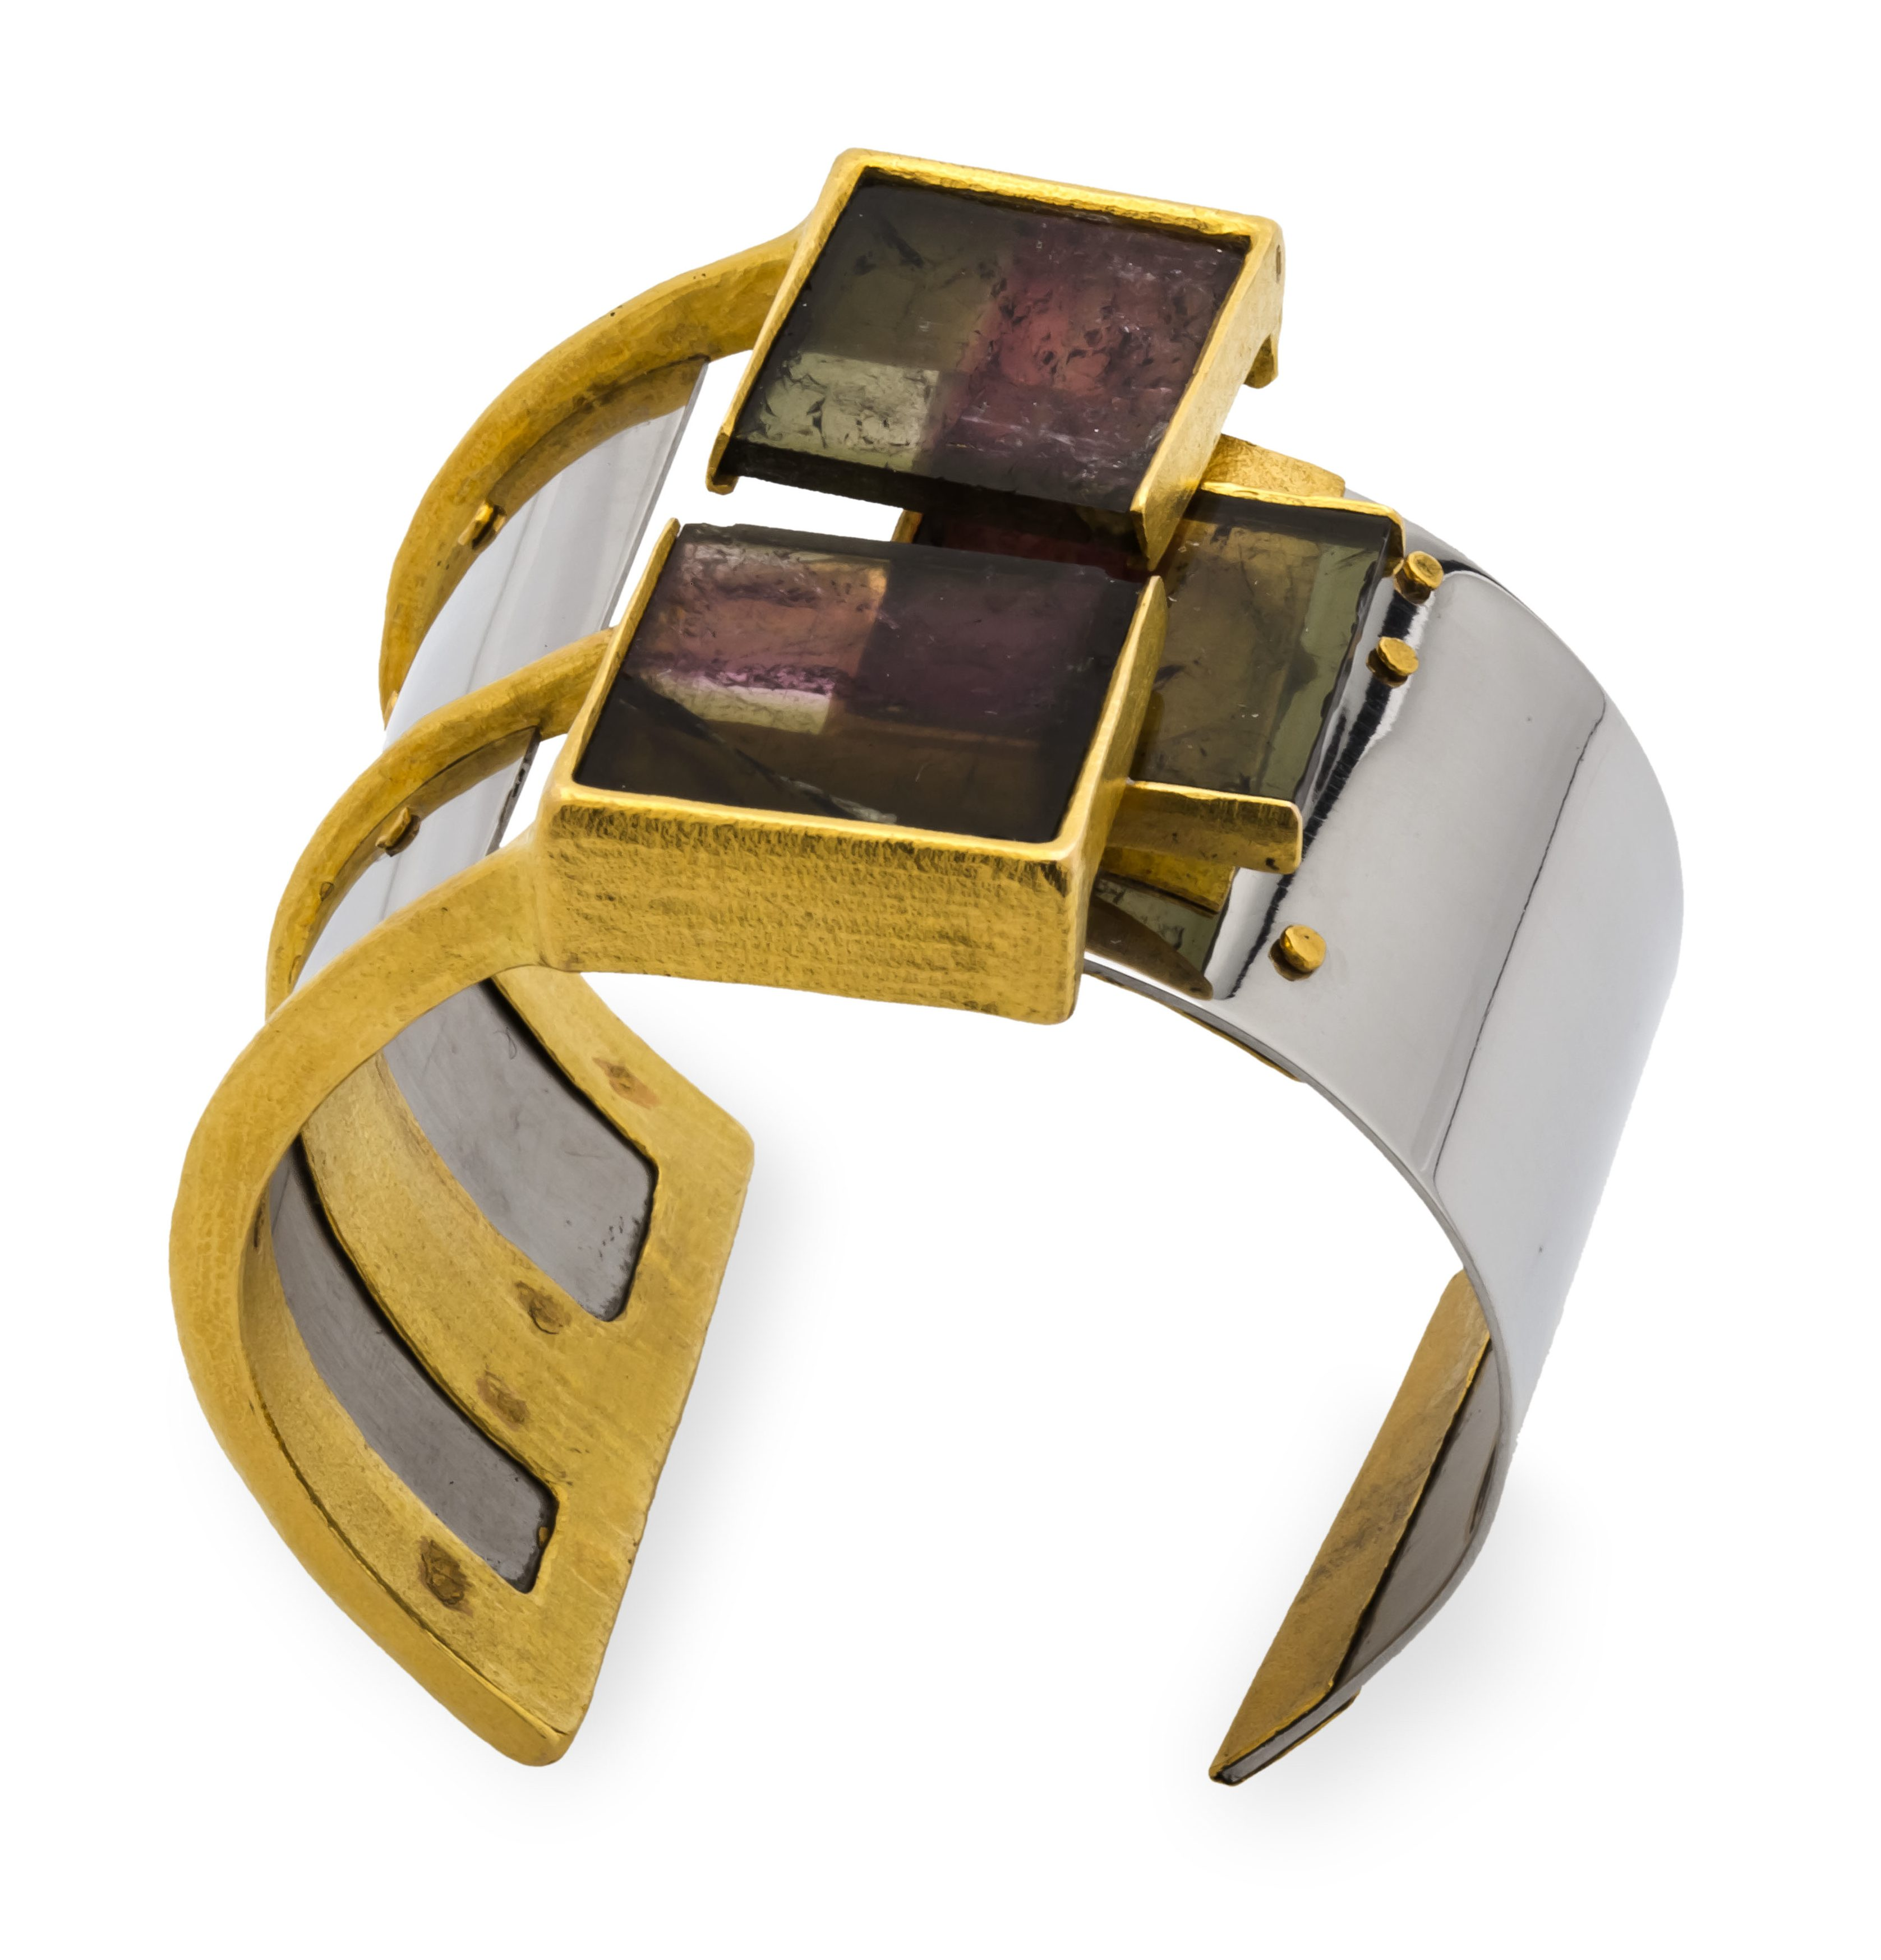 Klaus Ullrich, armband, 1971. Collectie Ida Boelen-van Gelder. Fotografie Aldo Smit©